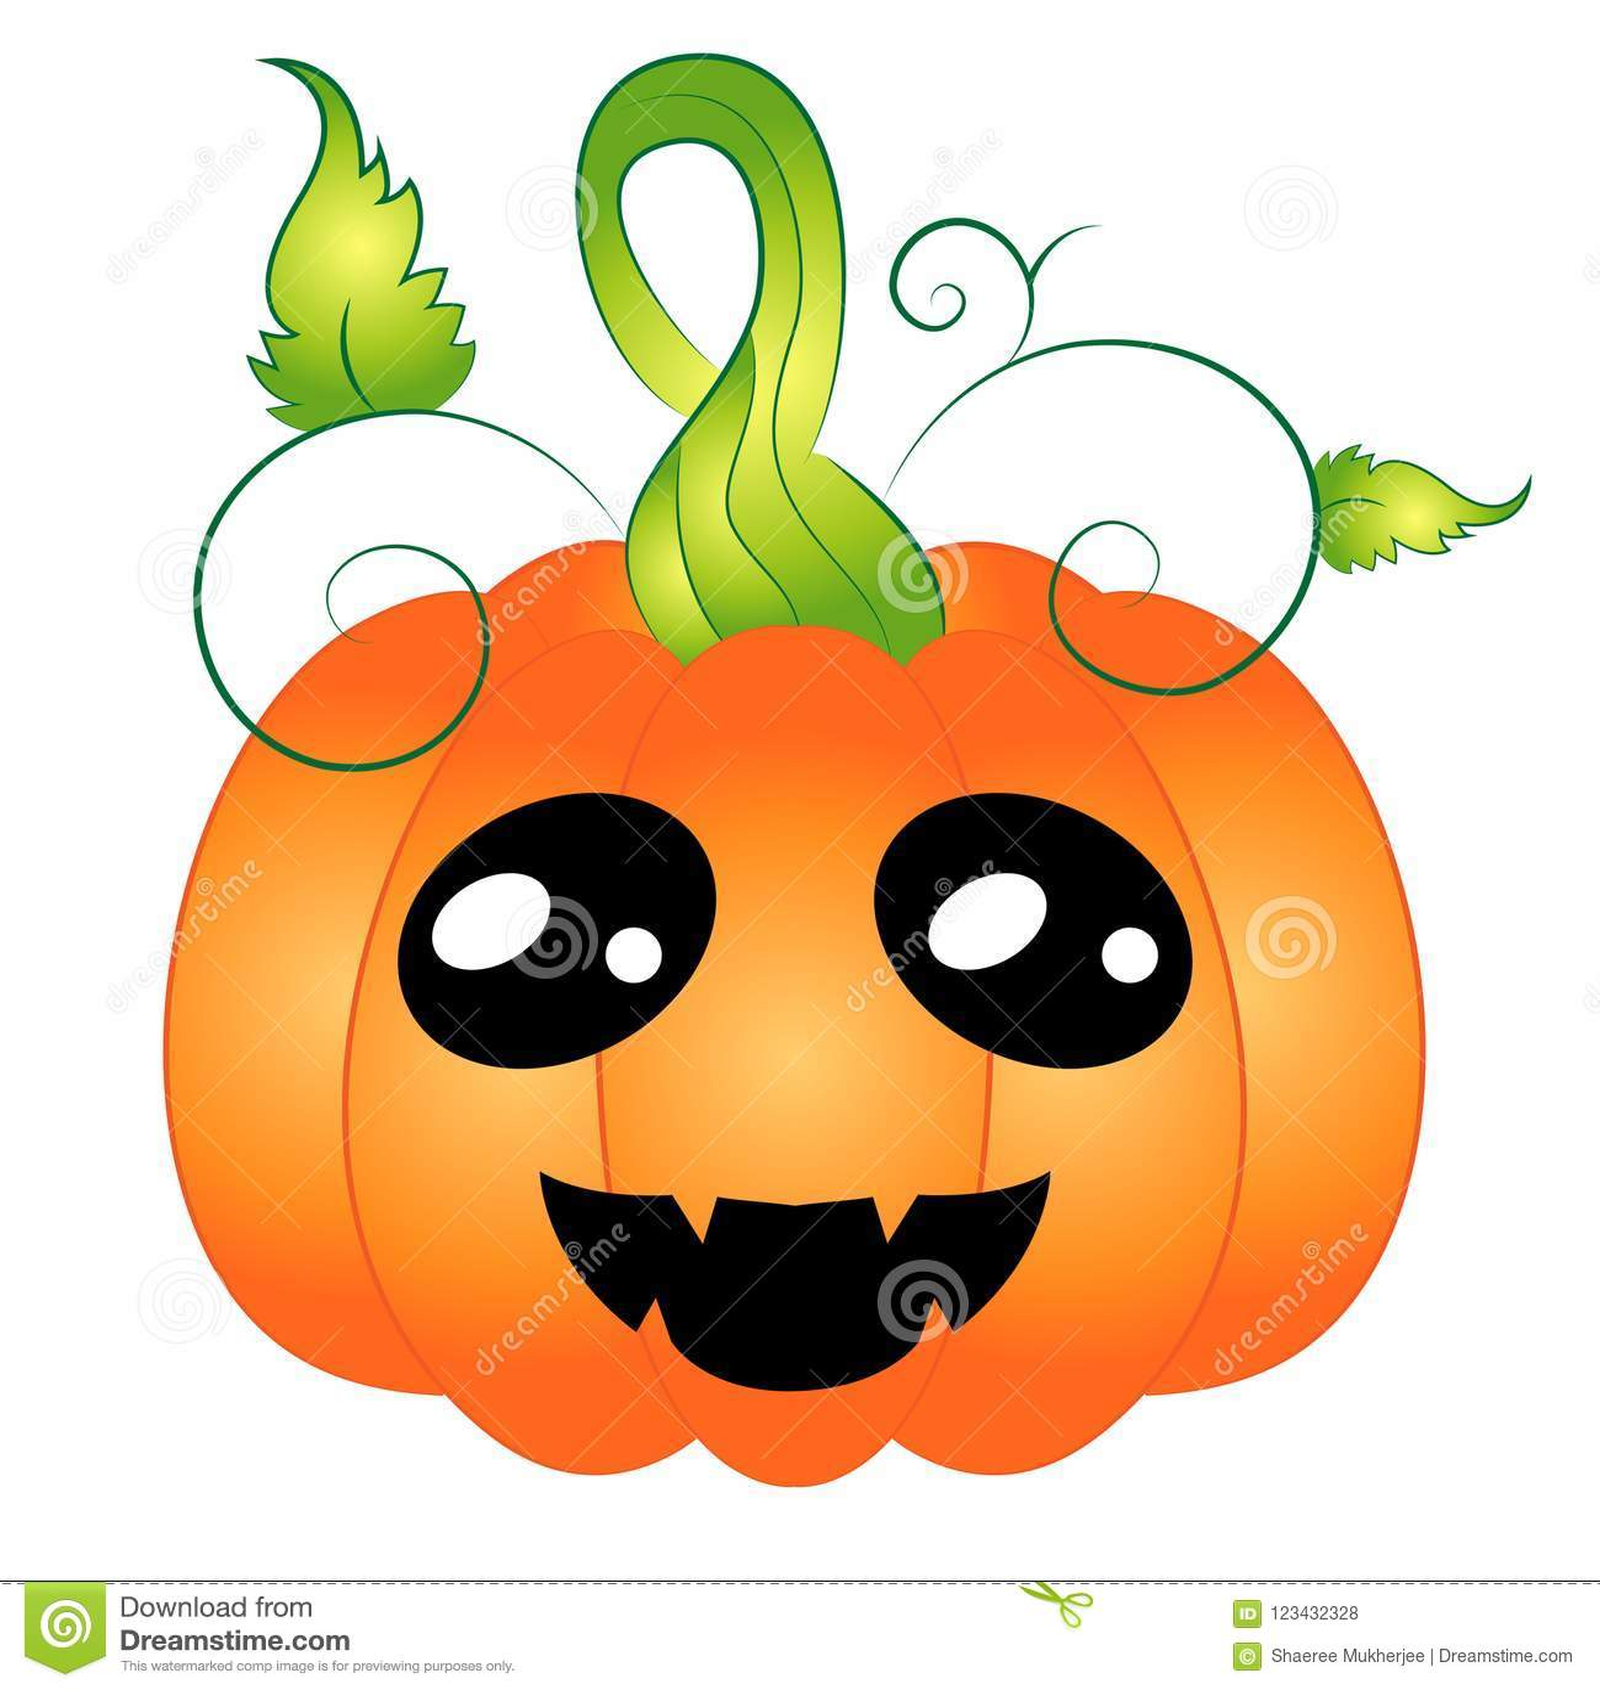 cartoon chibi halloween pumpkin